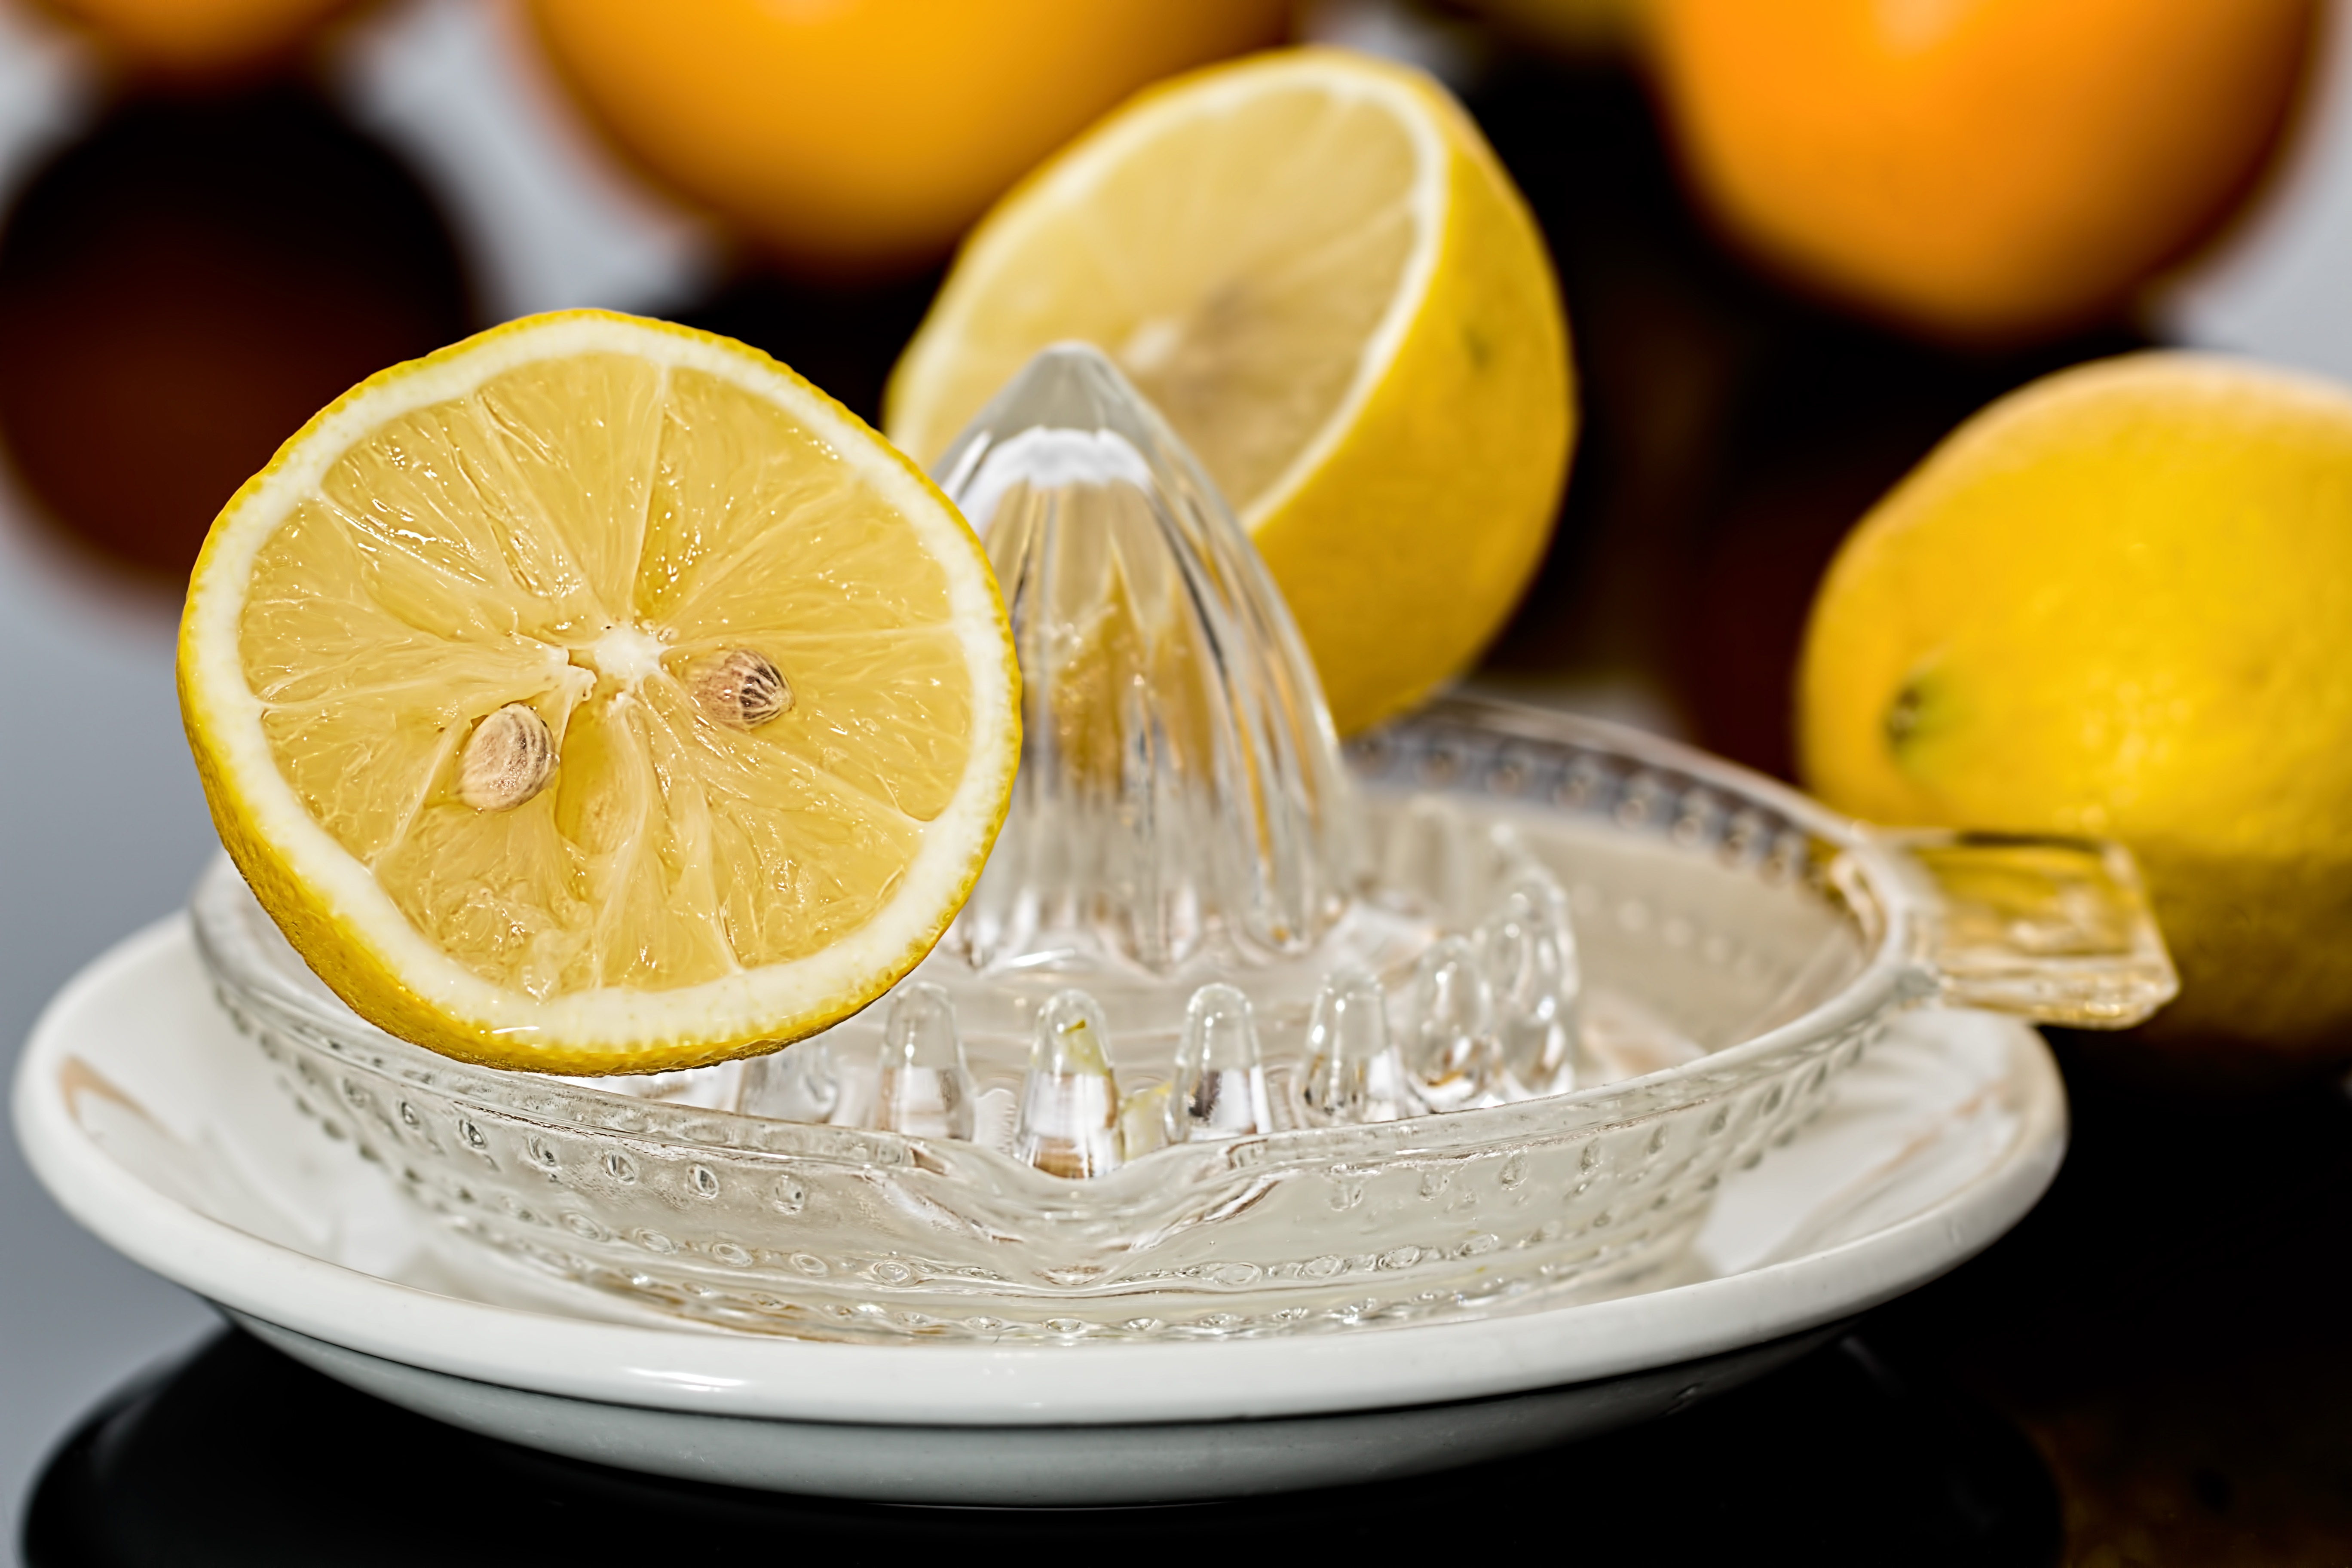 Mangler du lidt til immunforsvaret? Så overvej citroner…